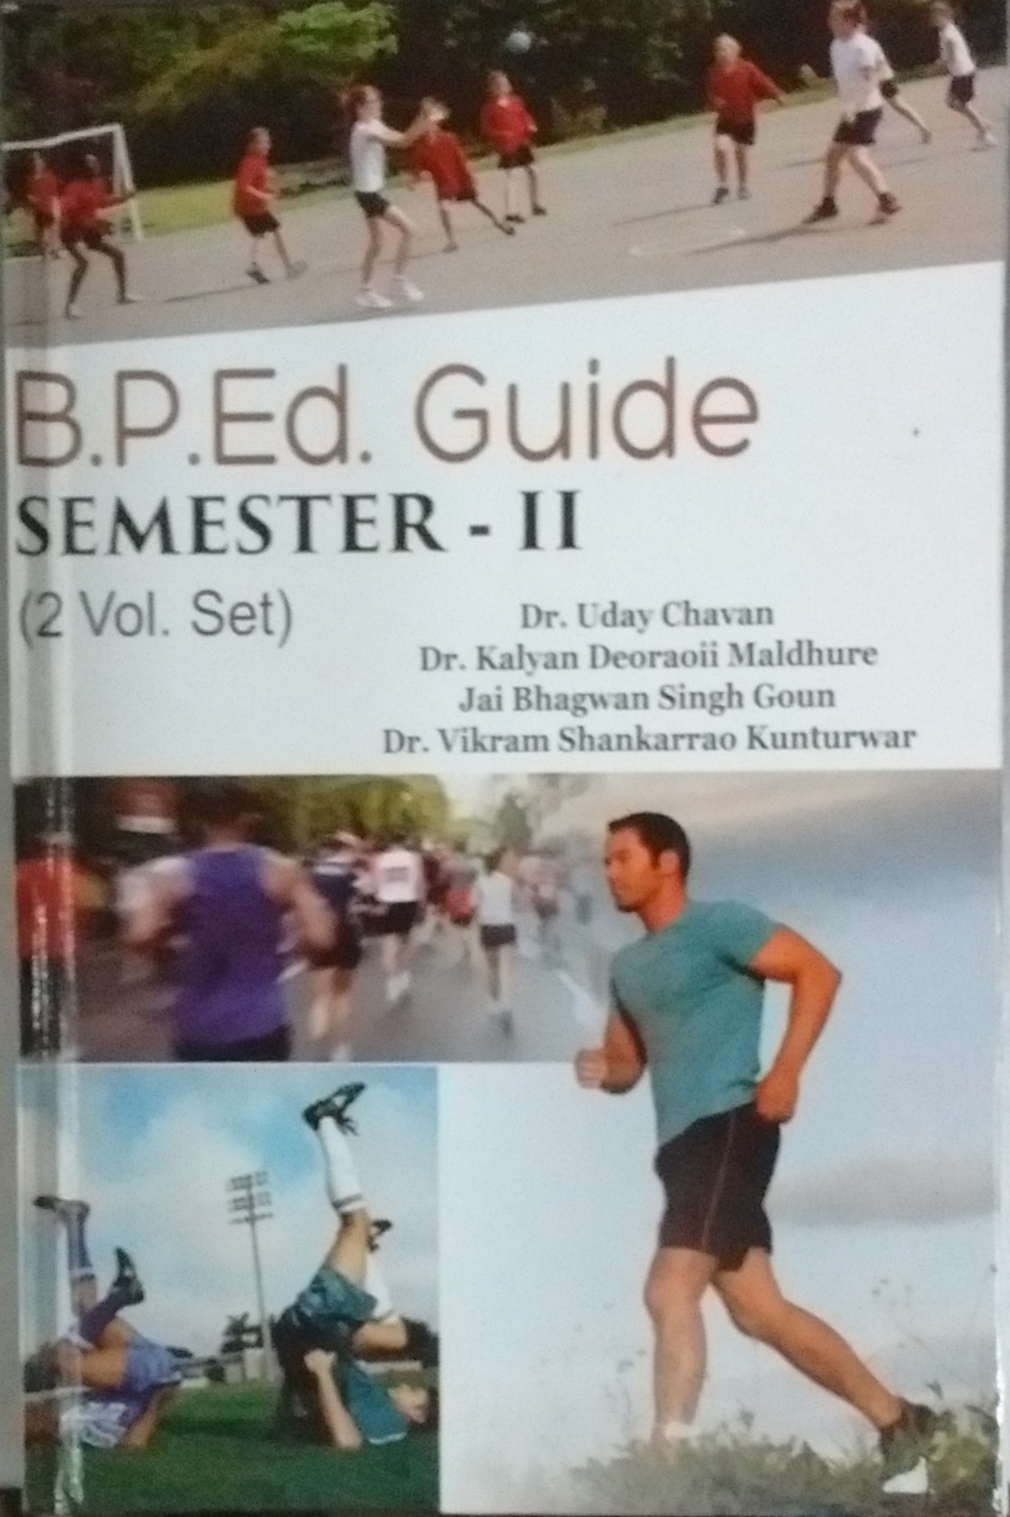 B P Ed. Guide Semester - II (2 Vols)